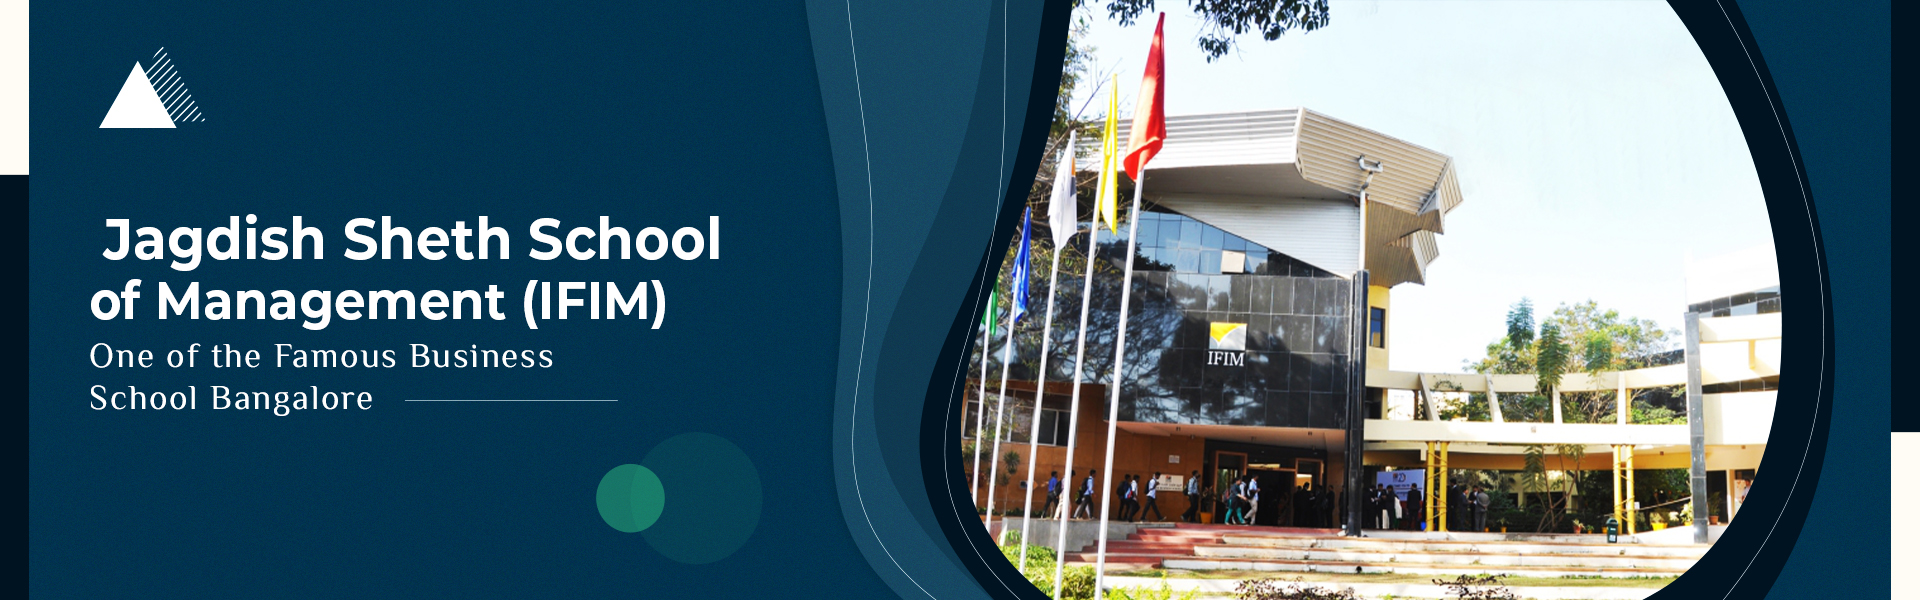 Jagdish Sheth IFIM Business School of Management Bangalore 2021